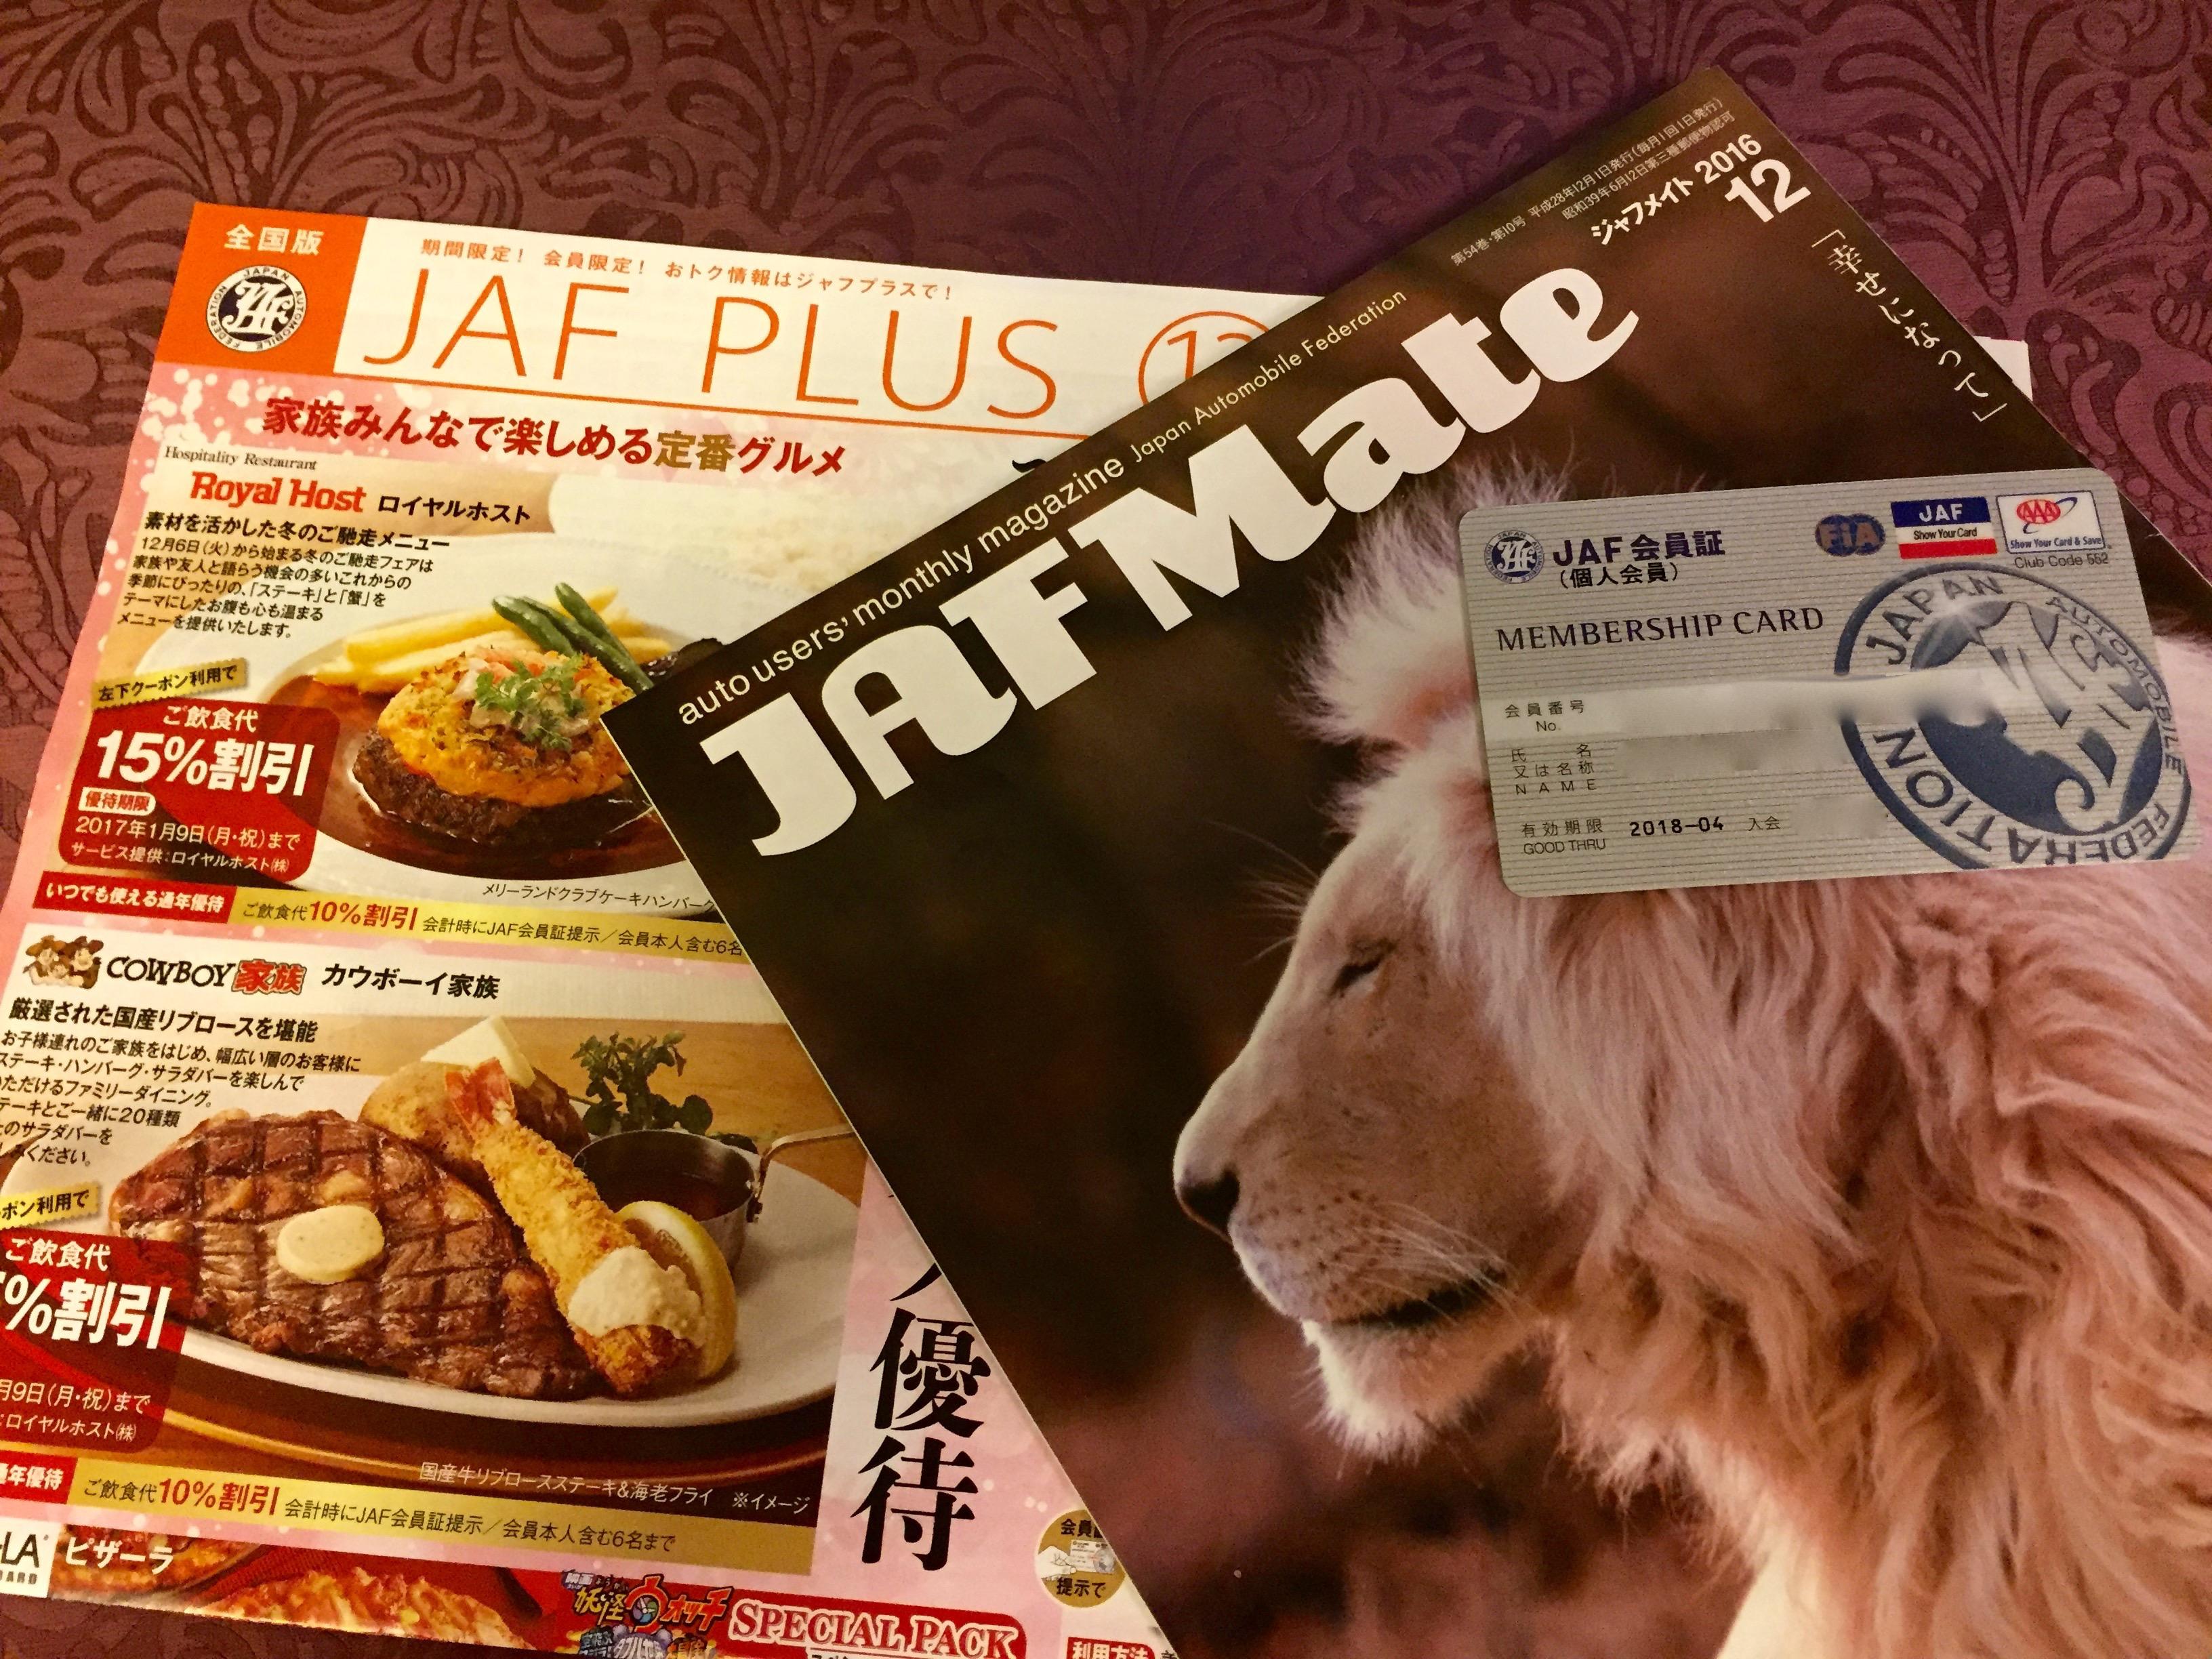 JAF会員証提示でCOWBOY家族・ロイヤルホストがいつでも10%割引